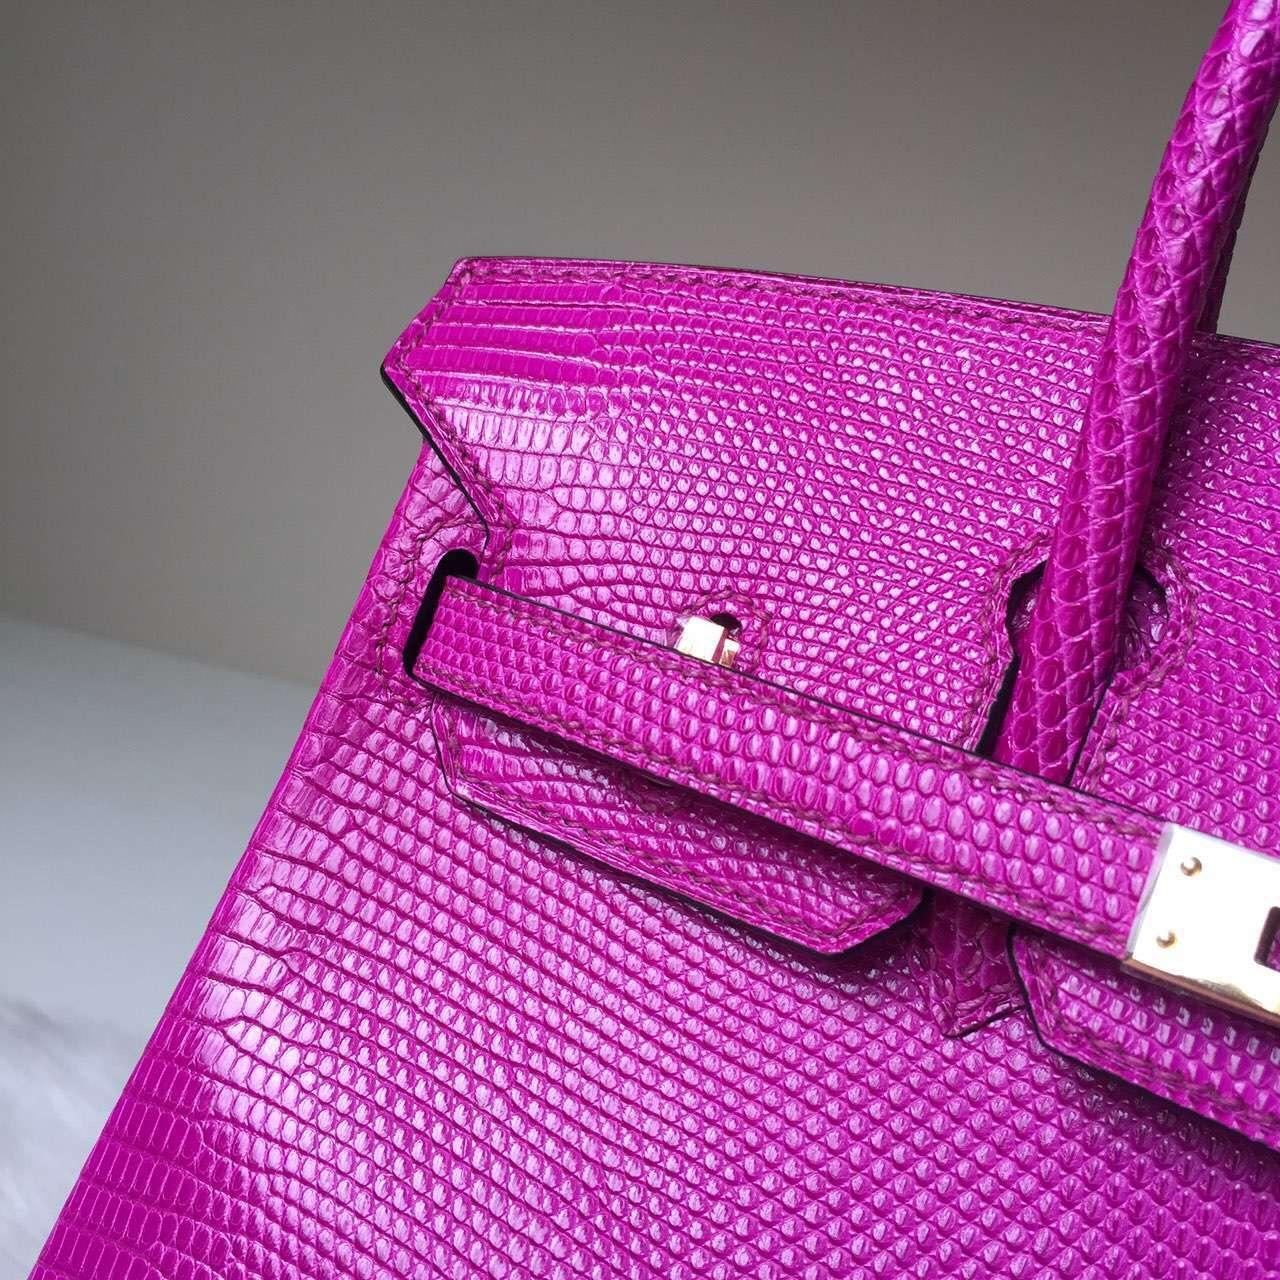 Hand Stitching Hermes Lizard Skin Leather Birkin25 Bag in Fuchsia